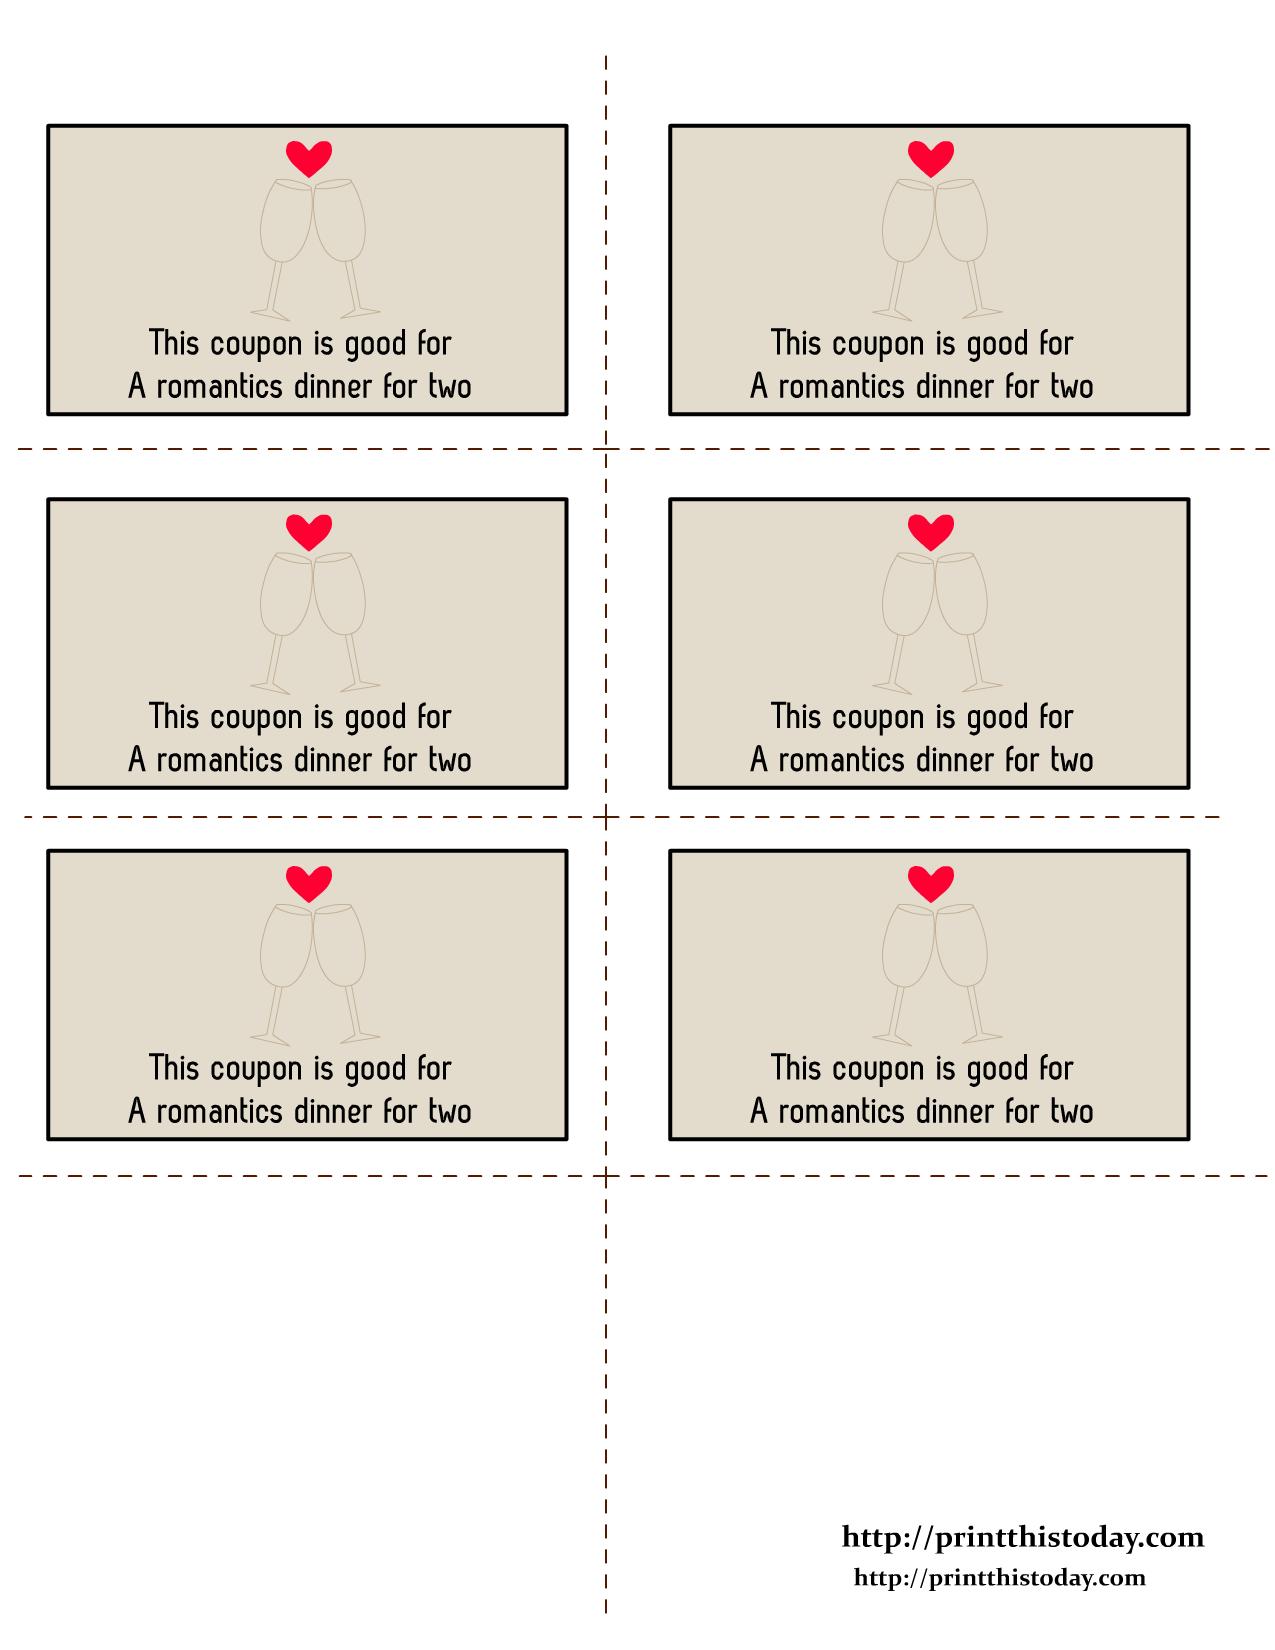 Free Printable Valentine Coupons | Free Printables | Love Coupons - Free Printable Love Coupons For Wife